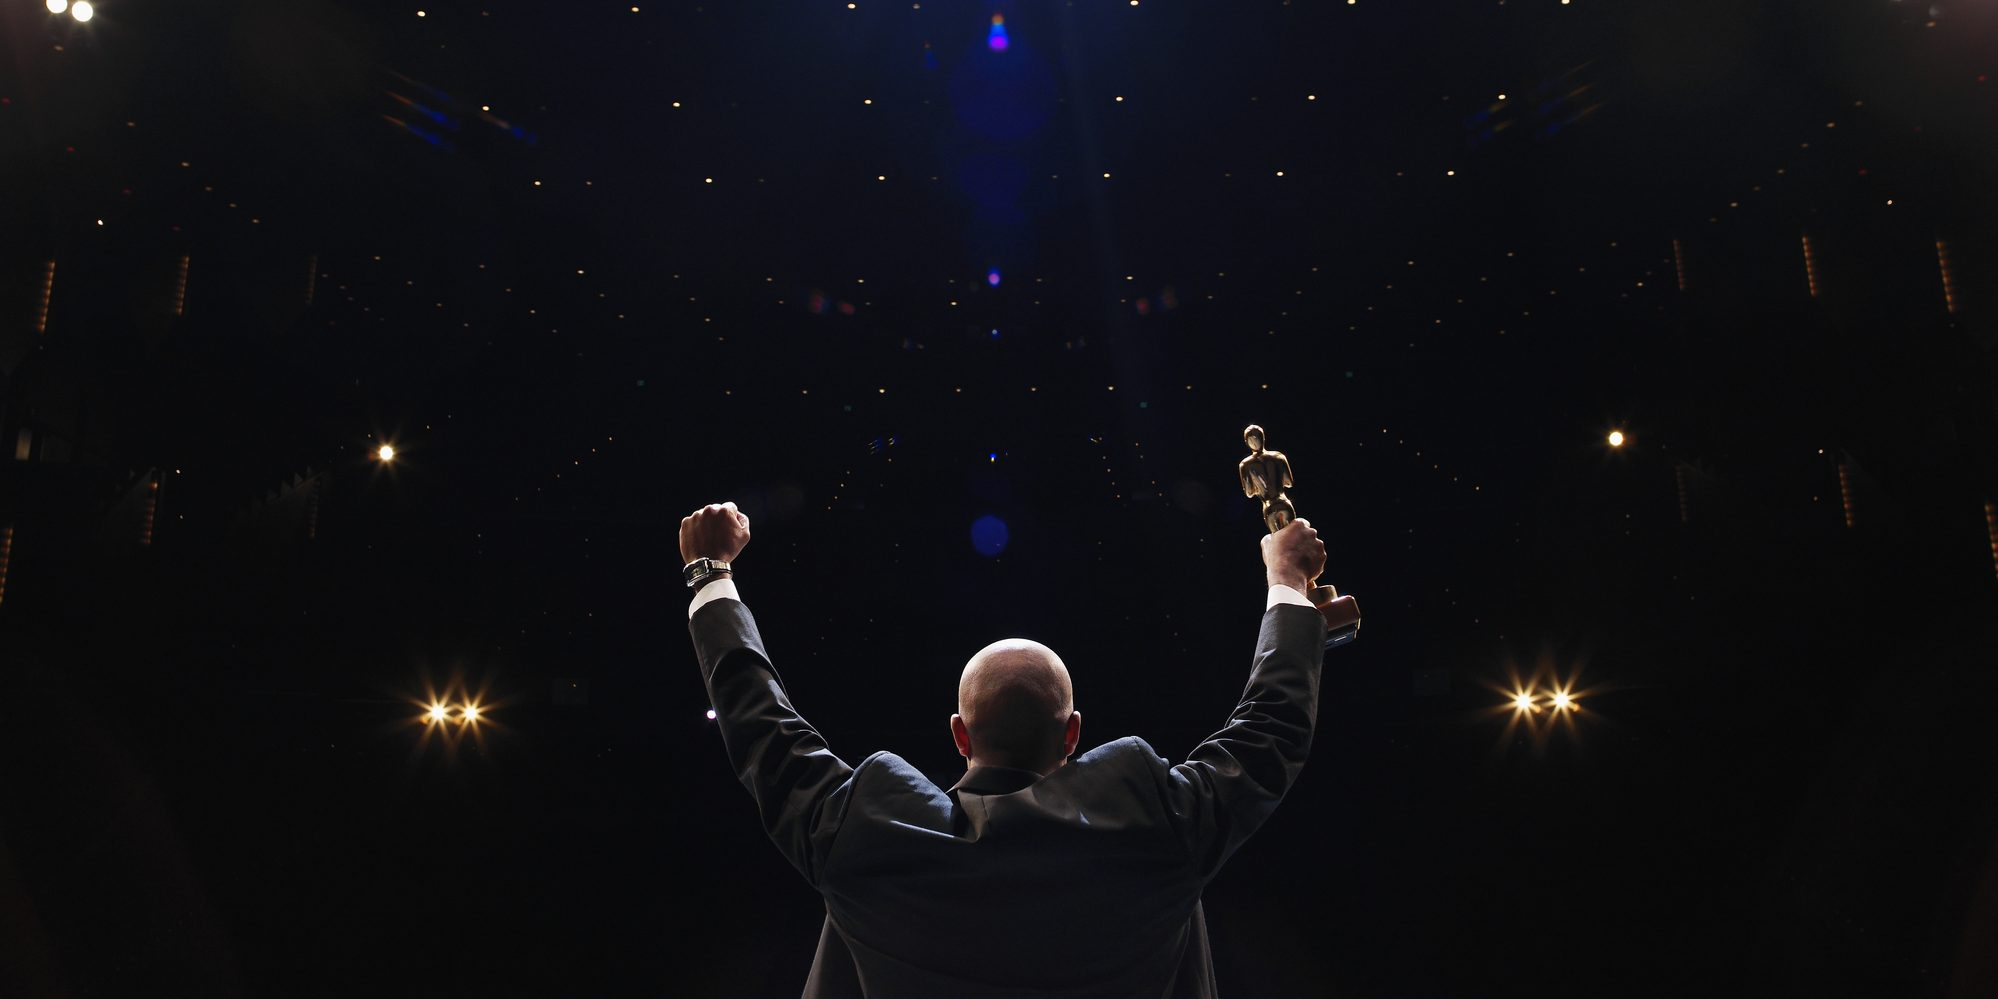 venturebeat.com - VB Staff - Announcing the second annual VentureBeat AI Innovation Awards at Transform 2020